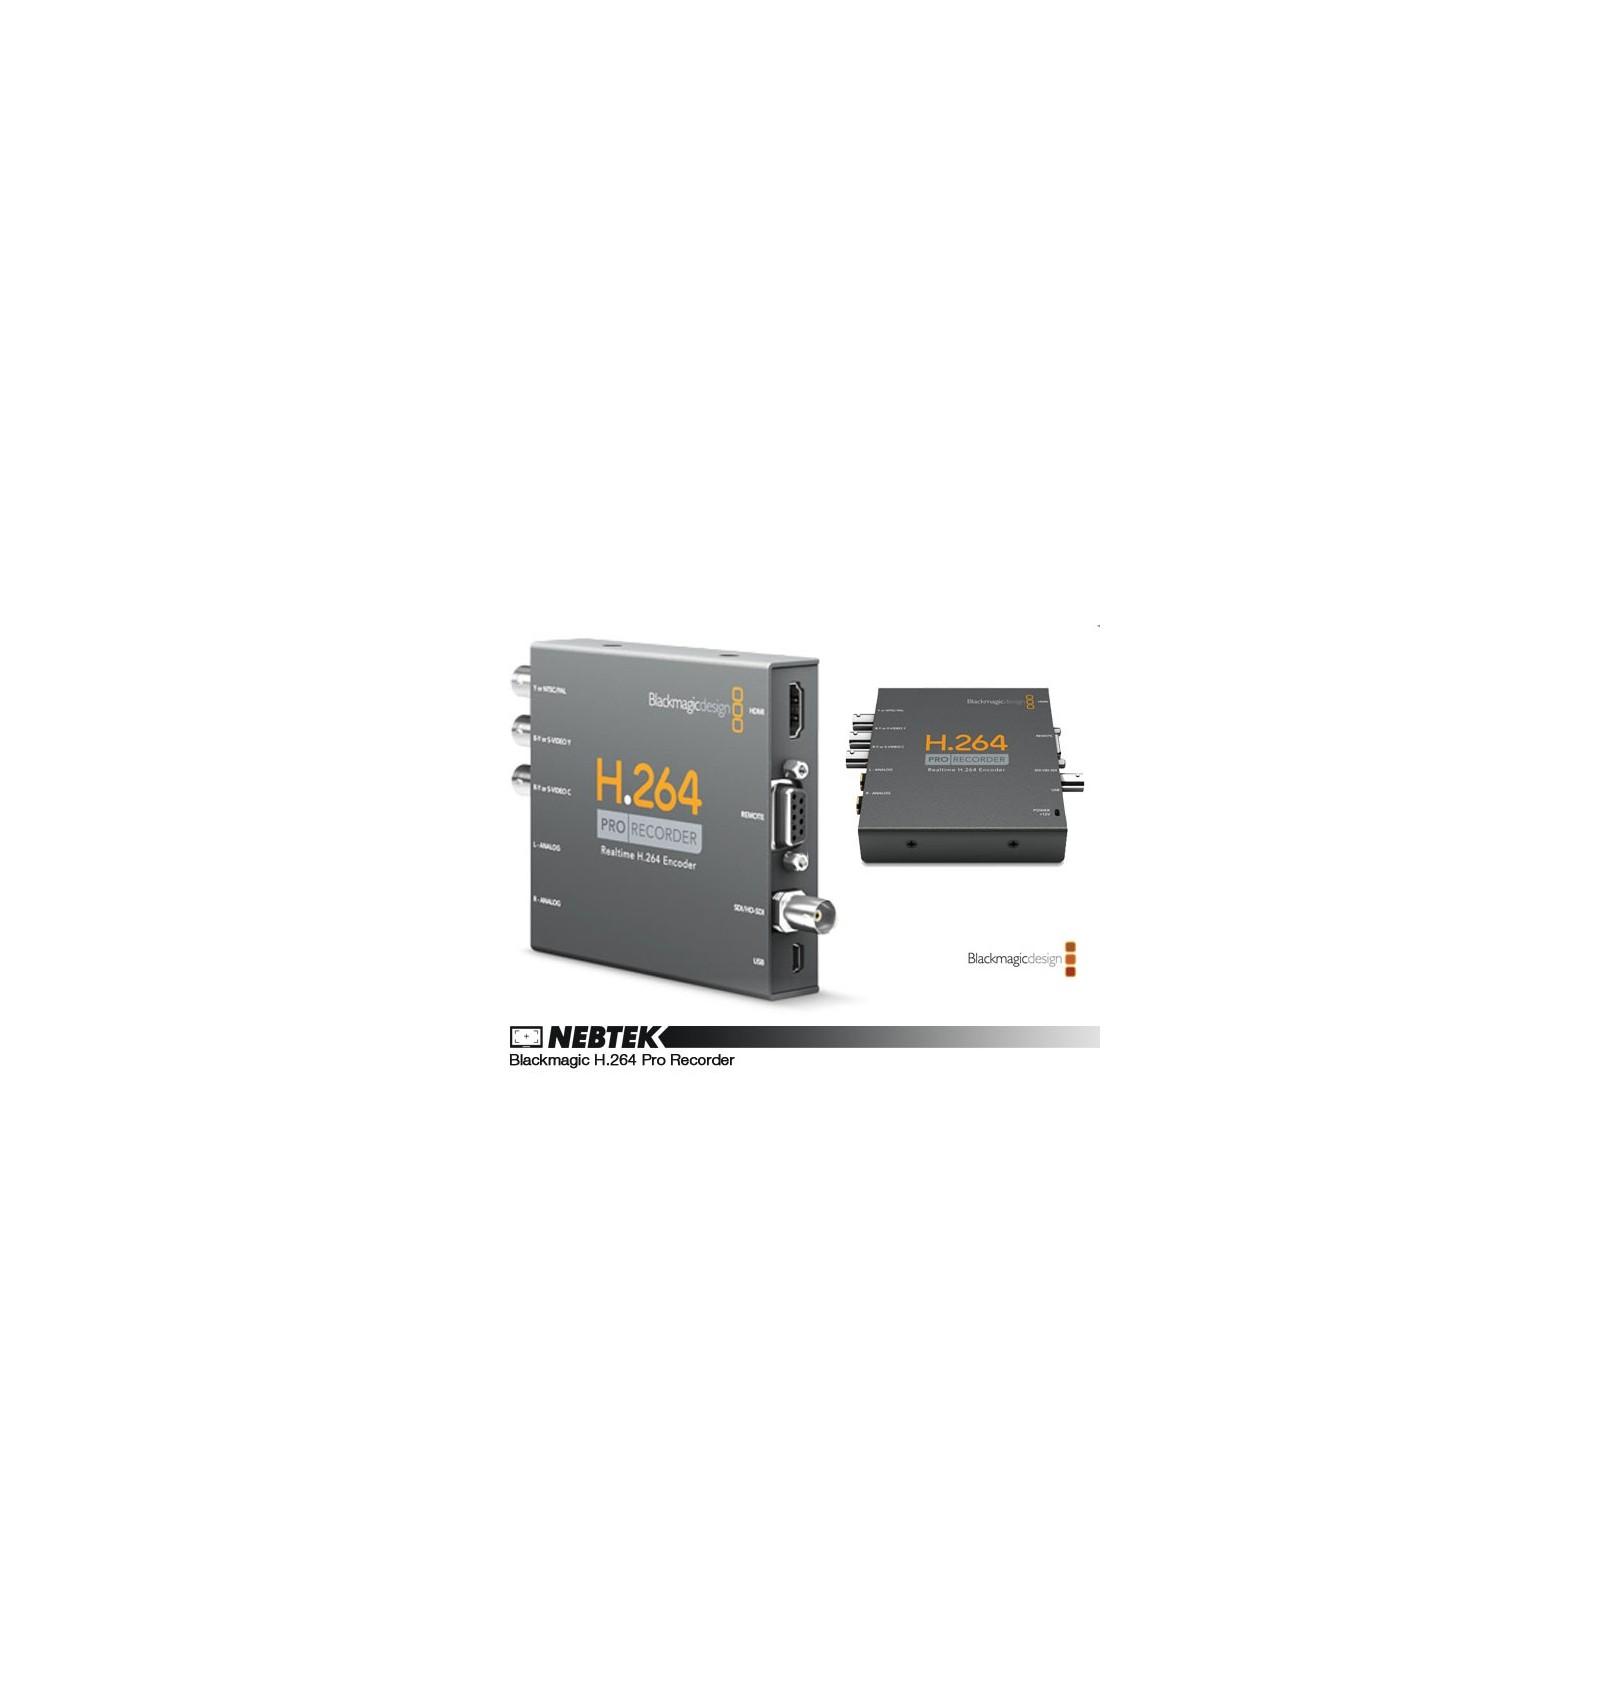 Blackmagic H 264 Pro Recorder Nebtek 3d Hd 4k Video Assist Specialists